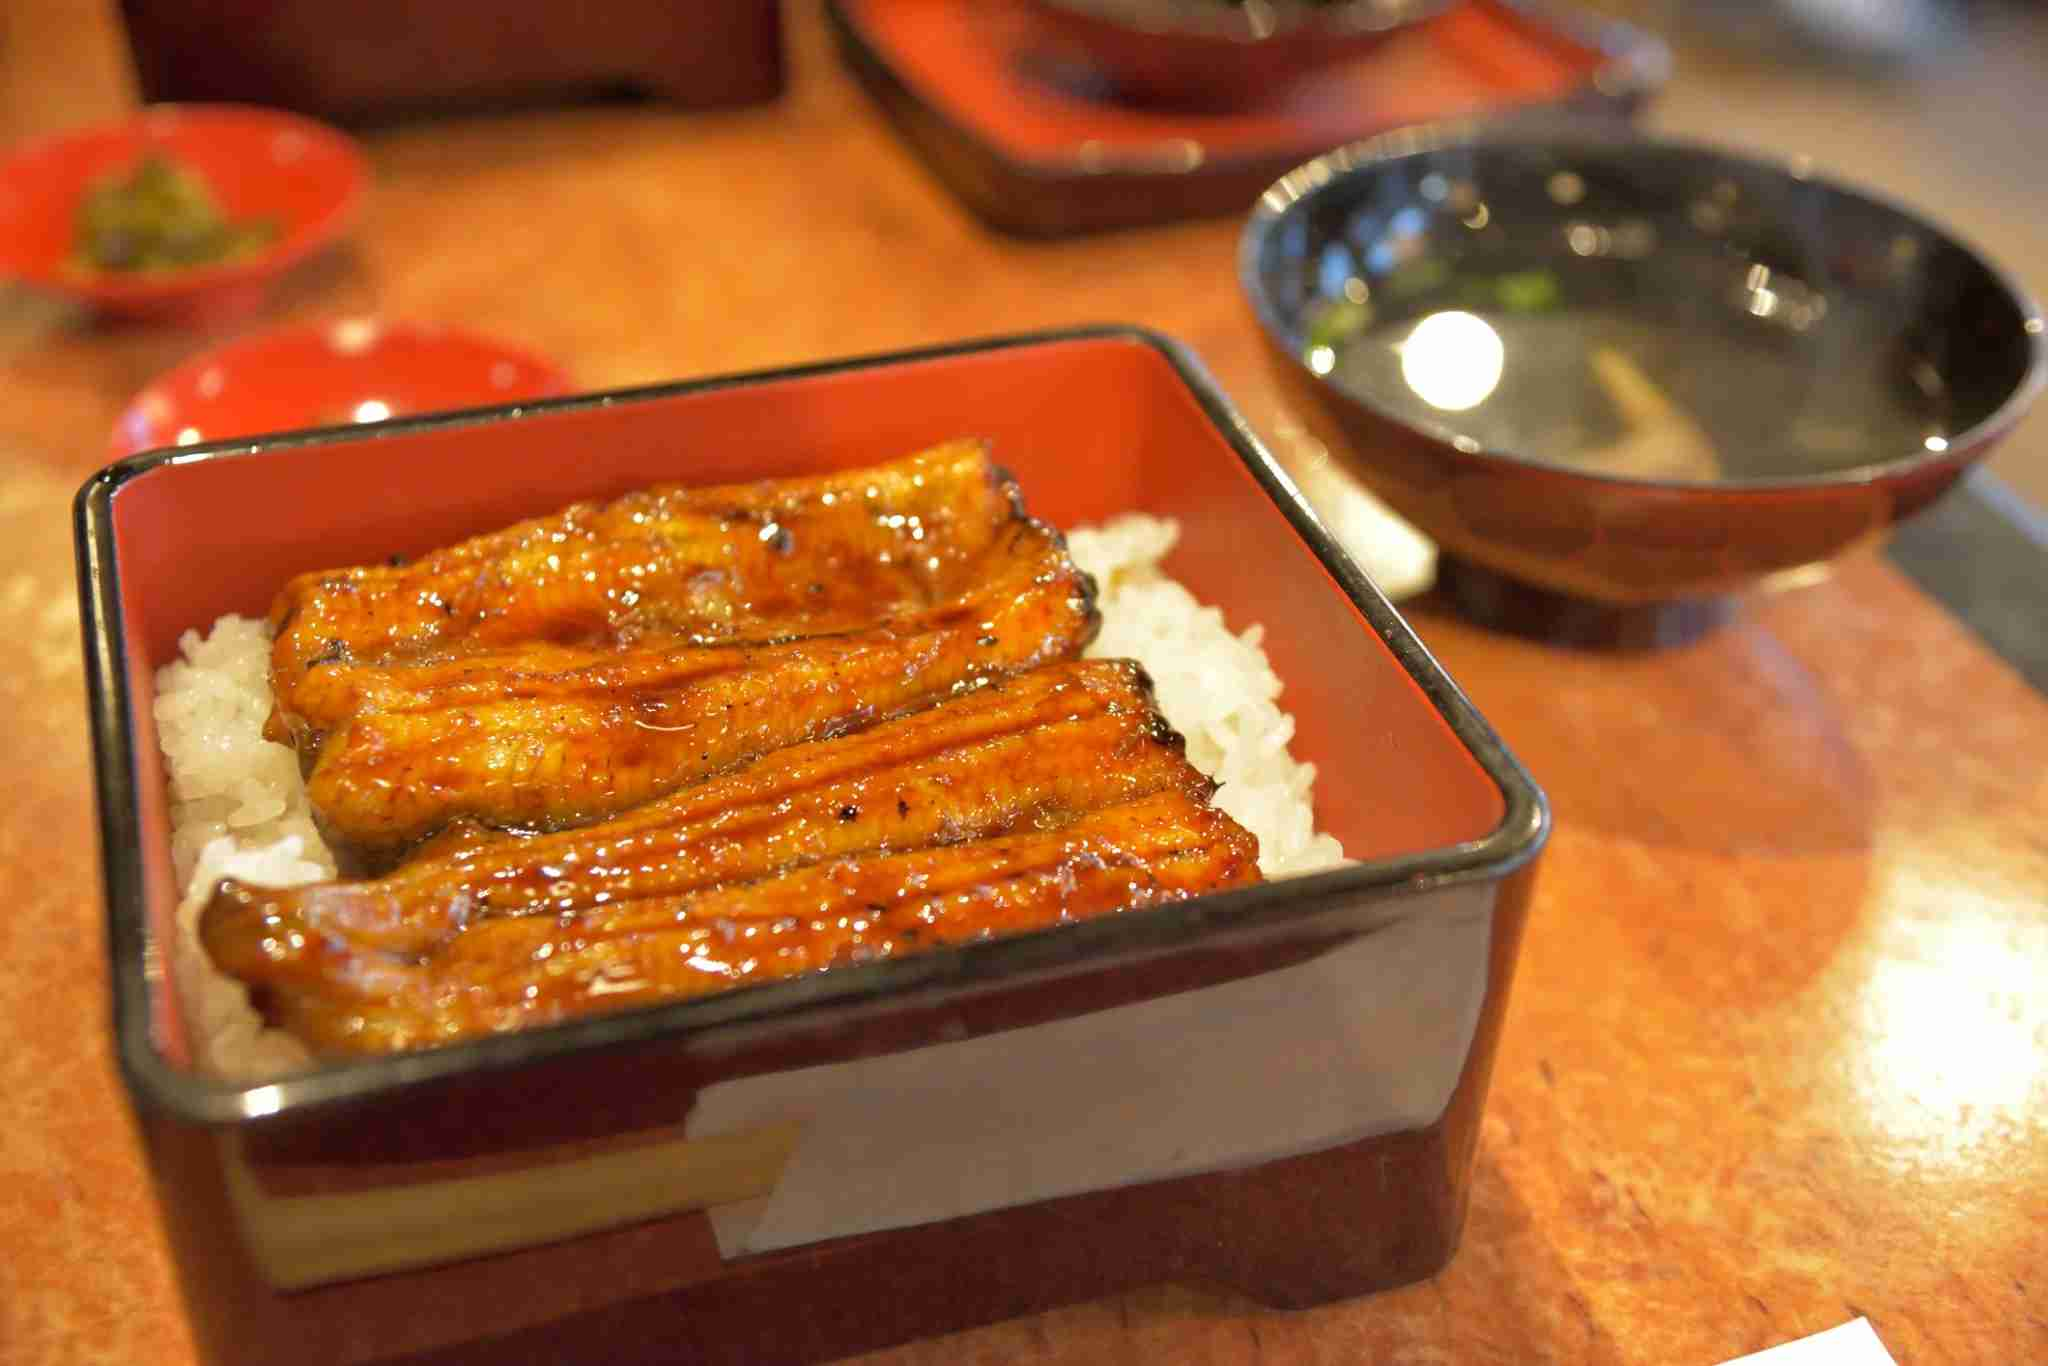 <em>Unaju</em> is <em>unagi</em> on rice served in a lacquered box. Image courtesy of Kosei Saito via Getty Images.